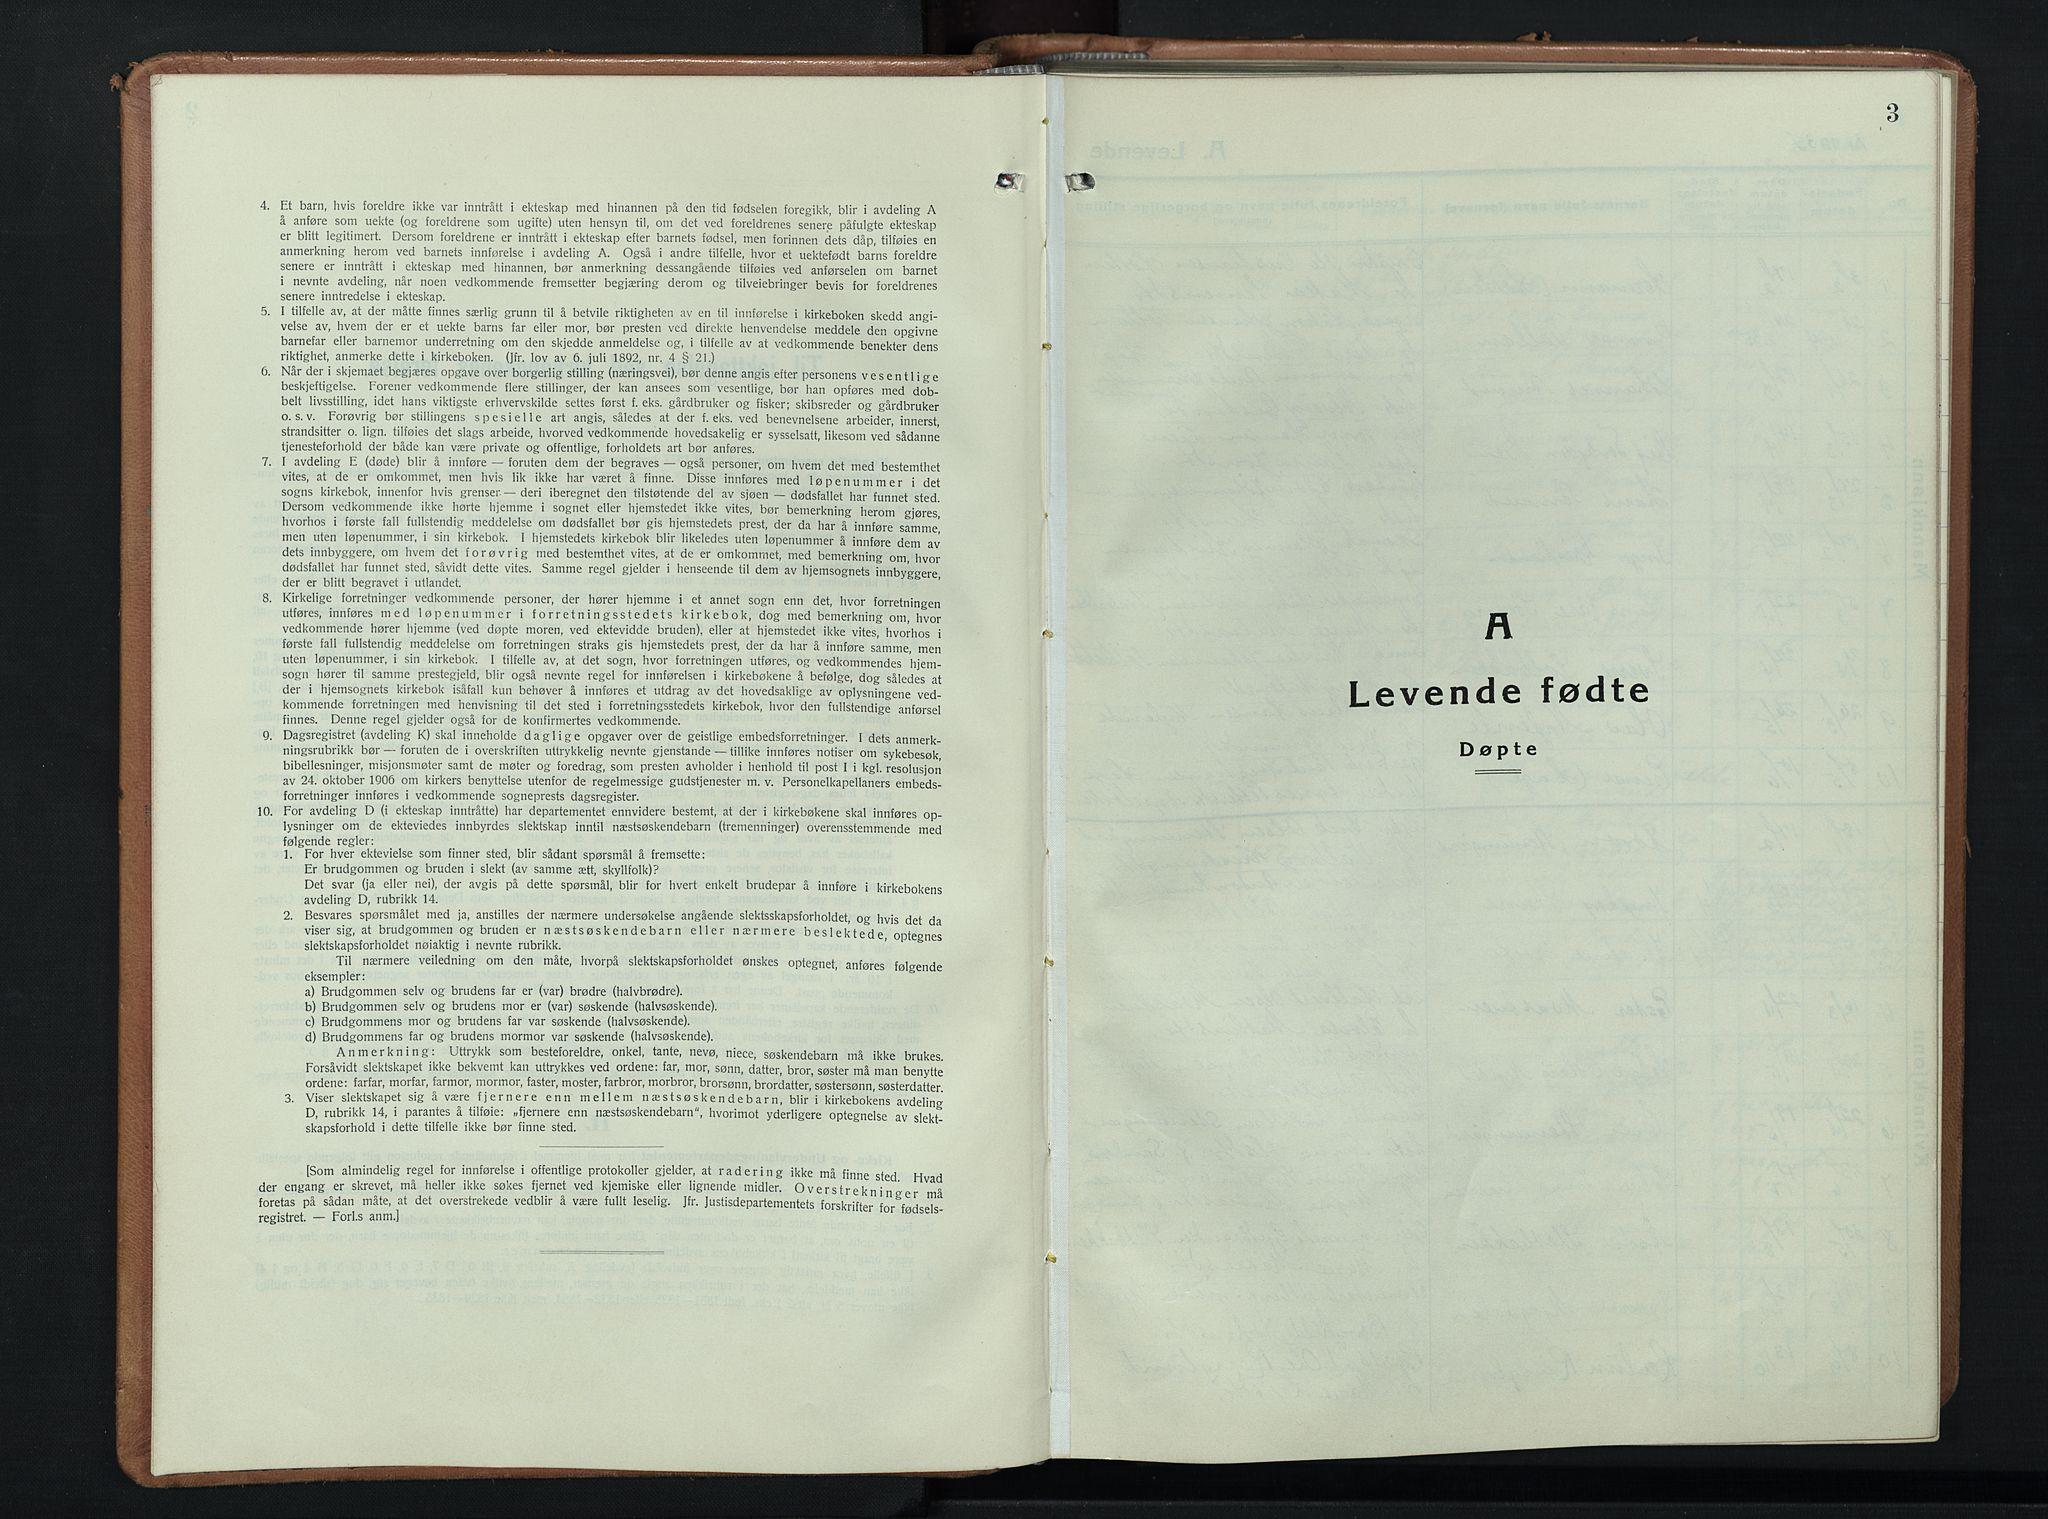 SAH, Ringebu prestekontor, Klokkerbok nr. 12, 1934-1949, s. 3